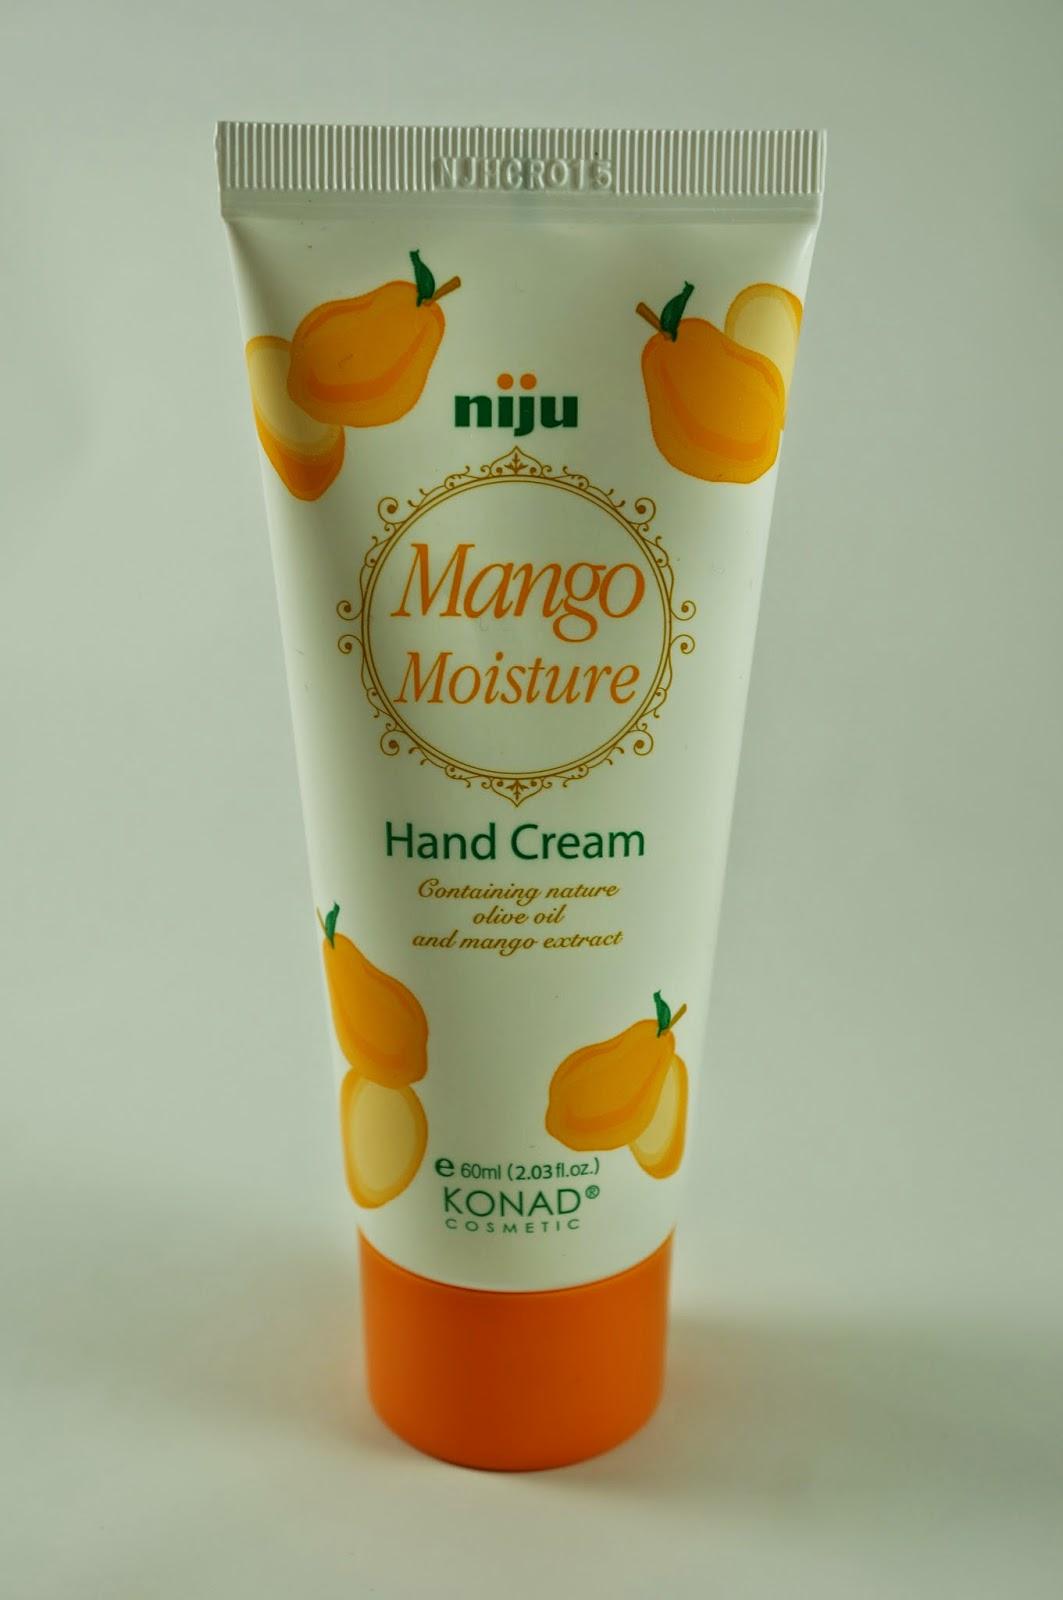 Memebox Scentbox #5 Tropical Fruits Unboxing Review KONAD niju Mango Moisture Hand Cream